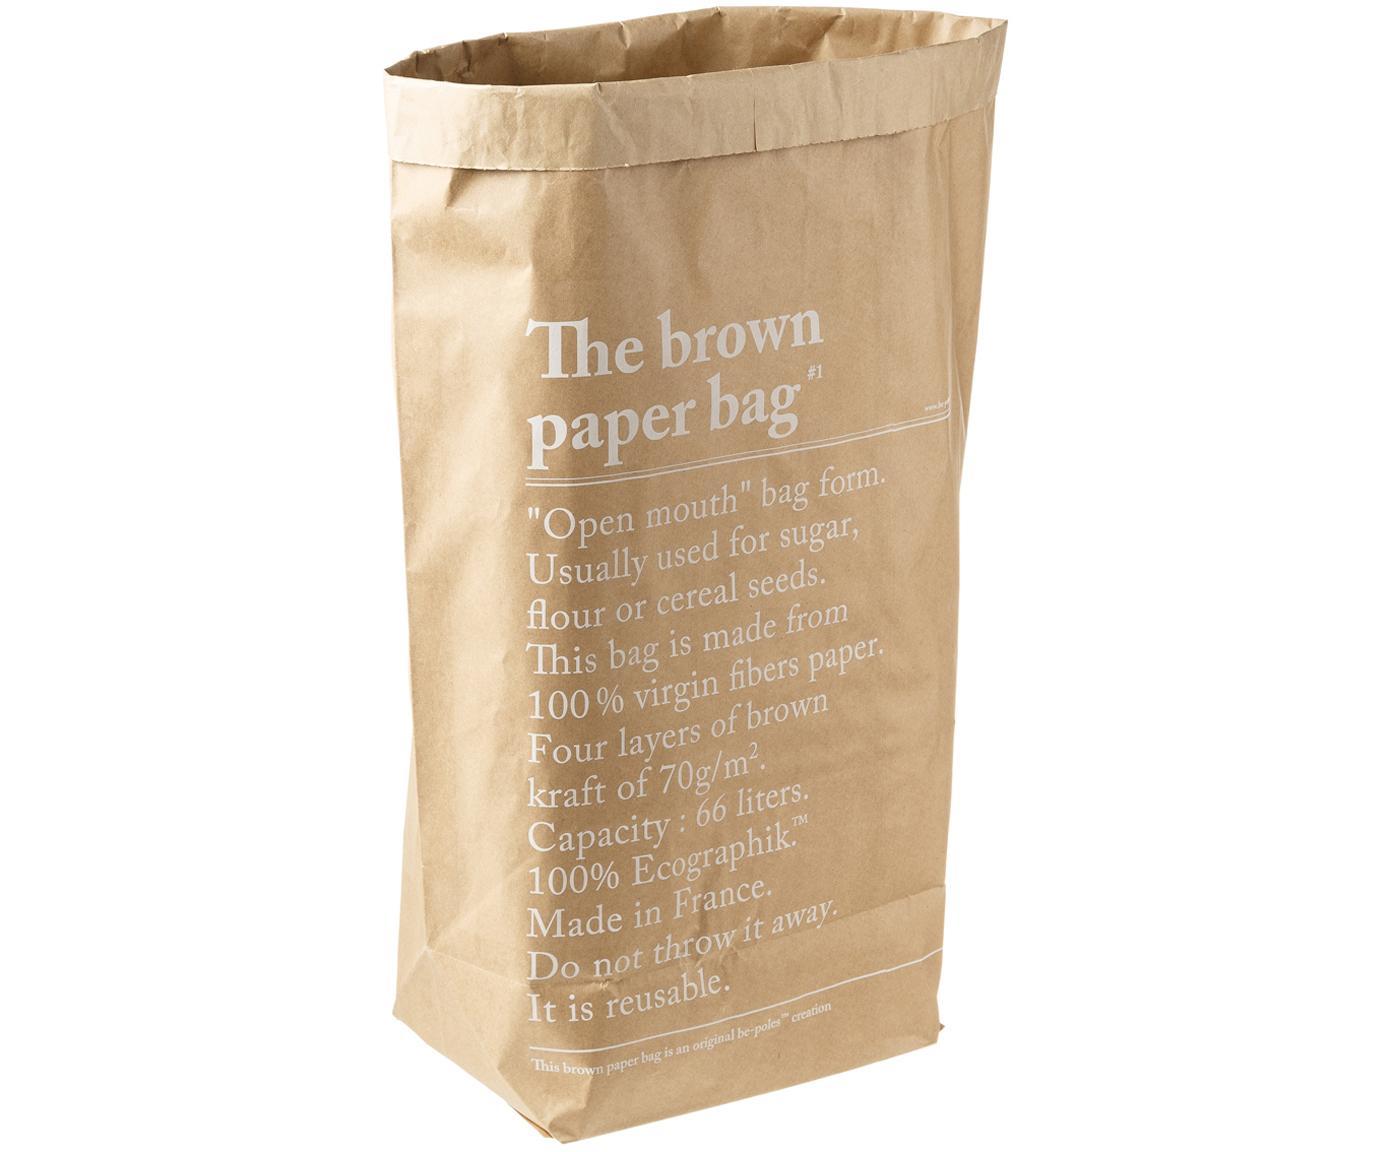 Bolsas de almacenaje Le sac en kraft brun, 2uds., Papel de fibra virgen, Marrón, An 50 x Al 69 cm